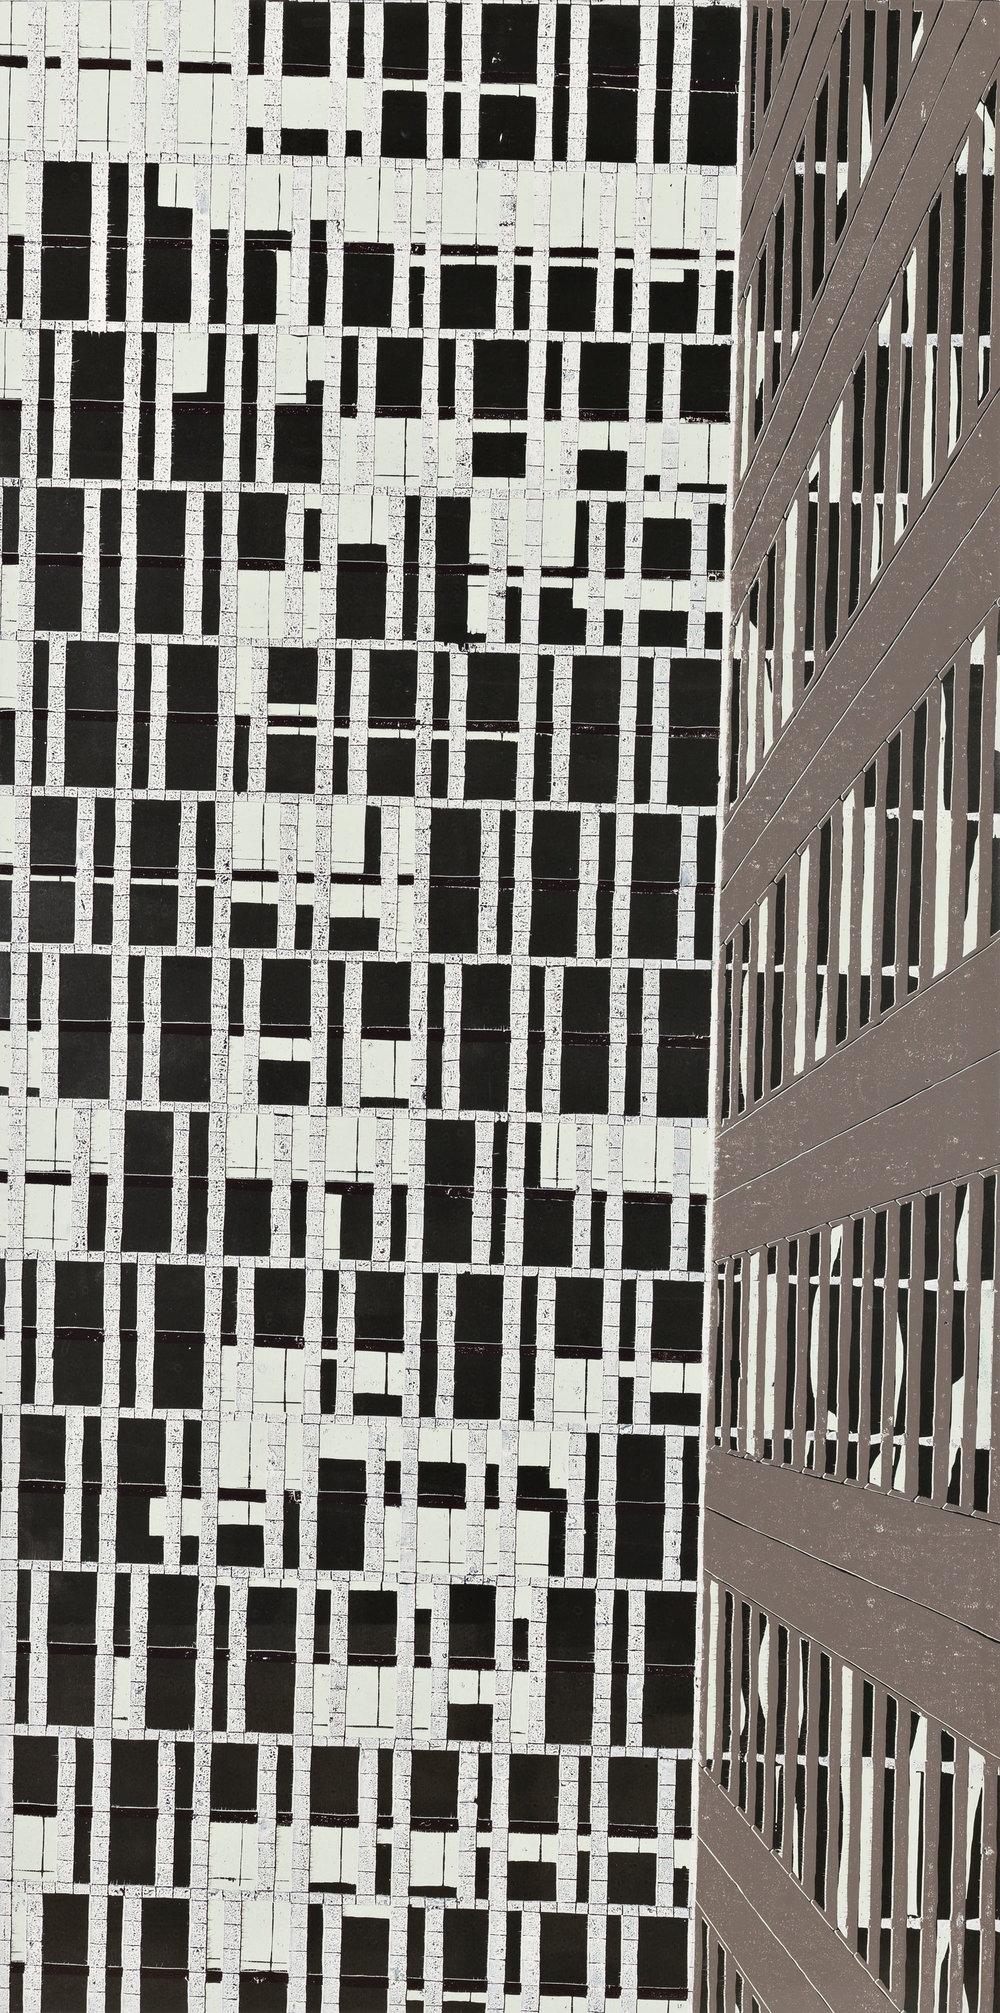 "Big Windows (2)  2016; Woodcut on mylar; 95 3/4"" x 47 3/4""; Self published; Edition of 2"